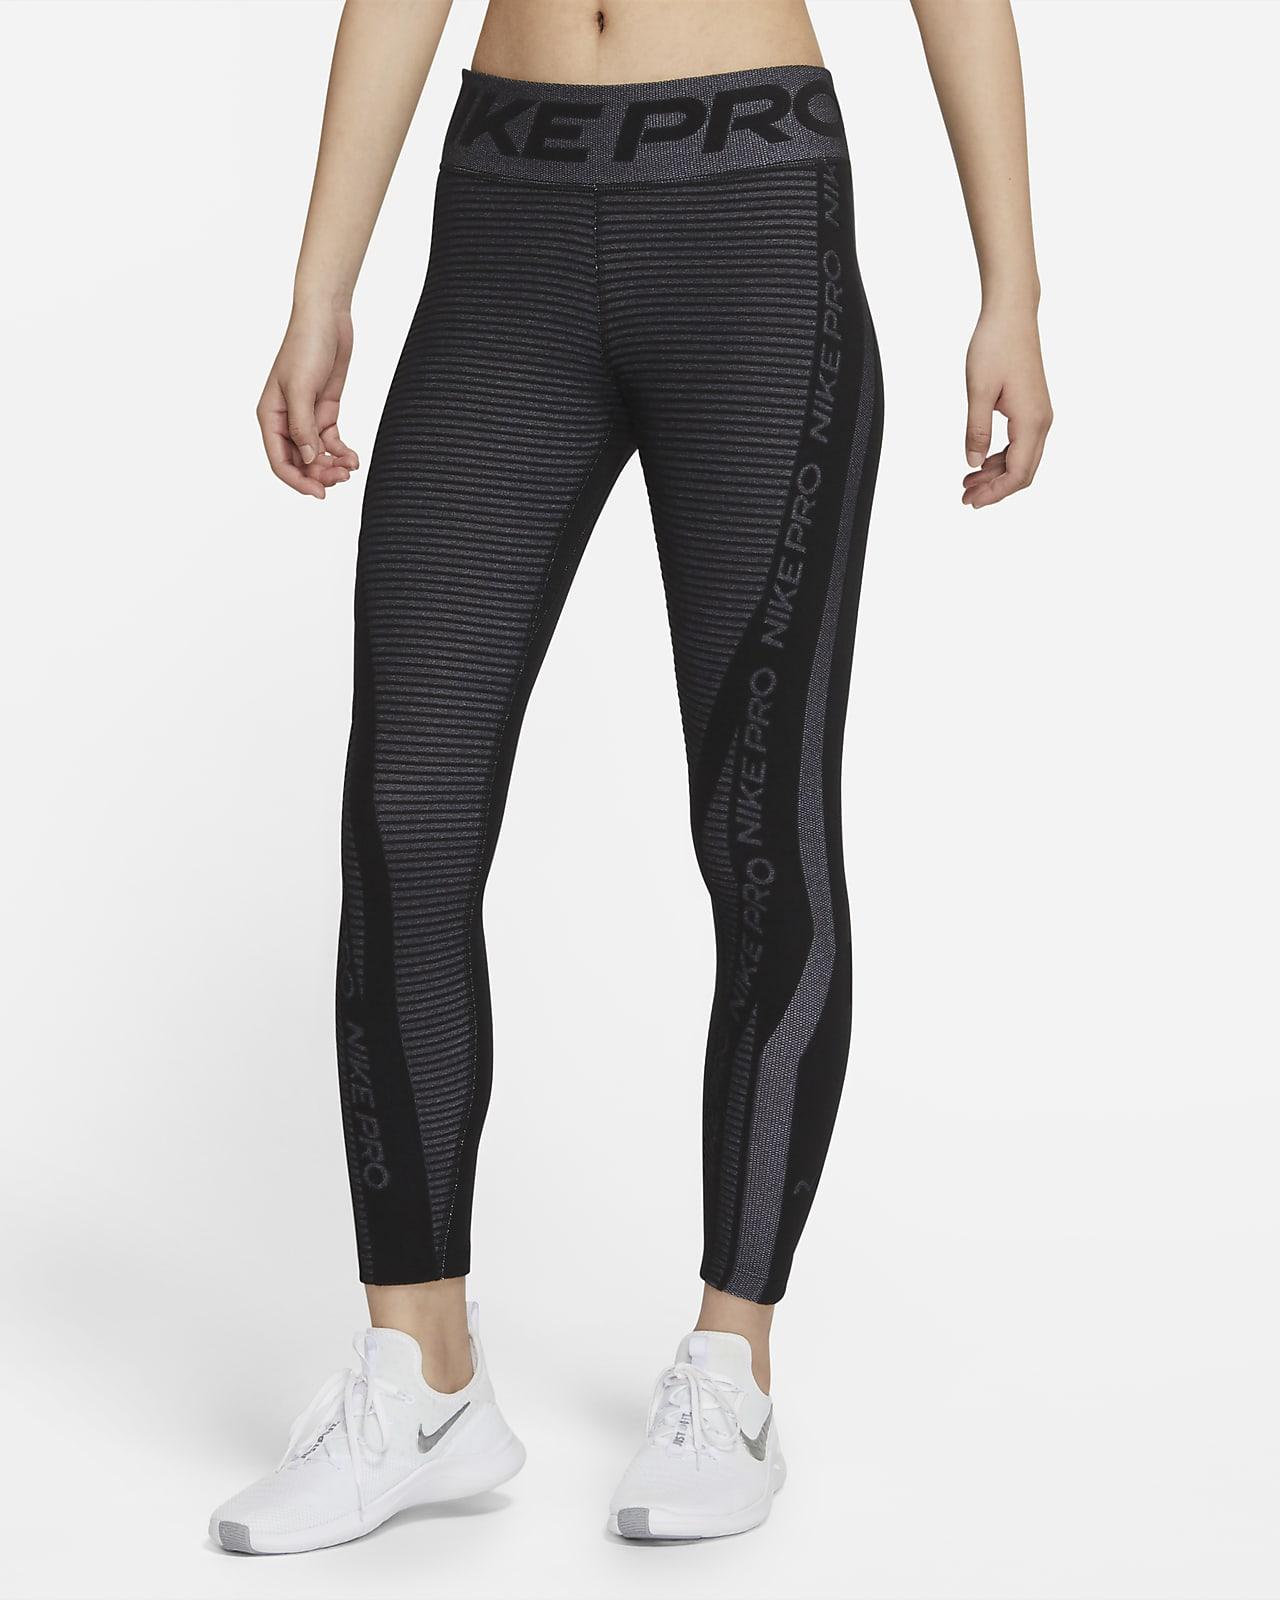 Nike Pro HyperWarm Women's Training Tights